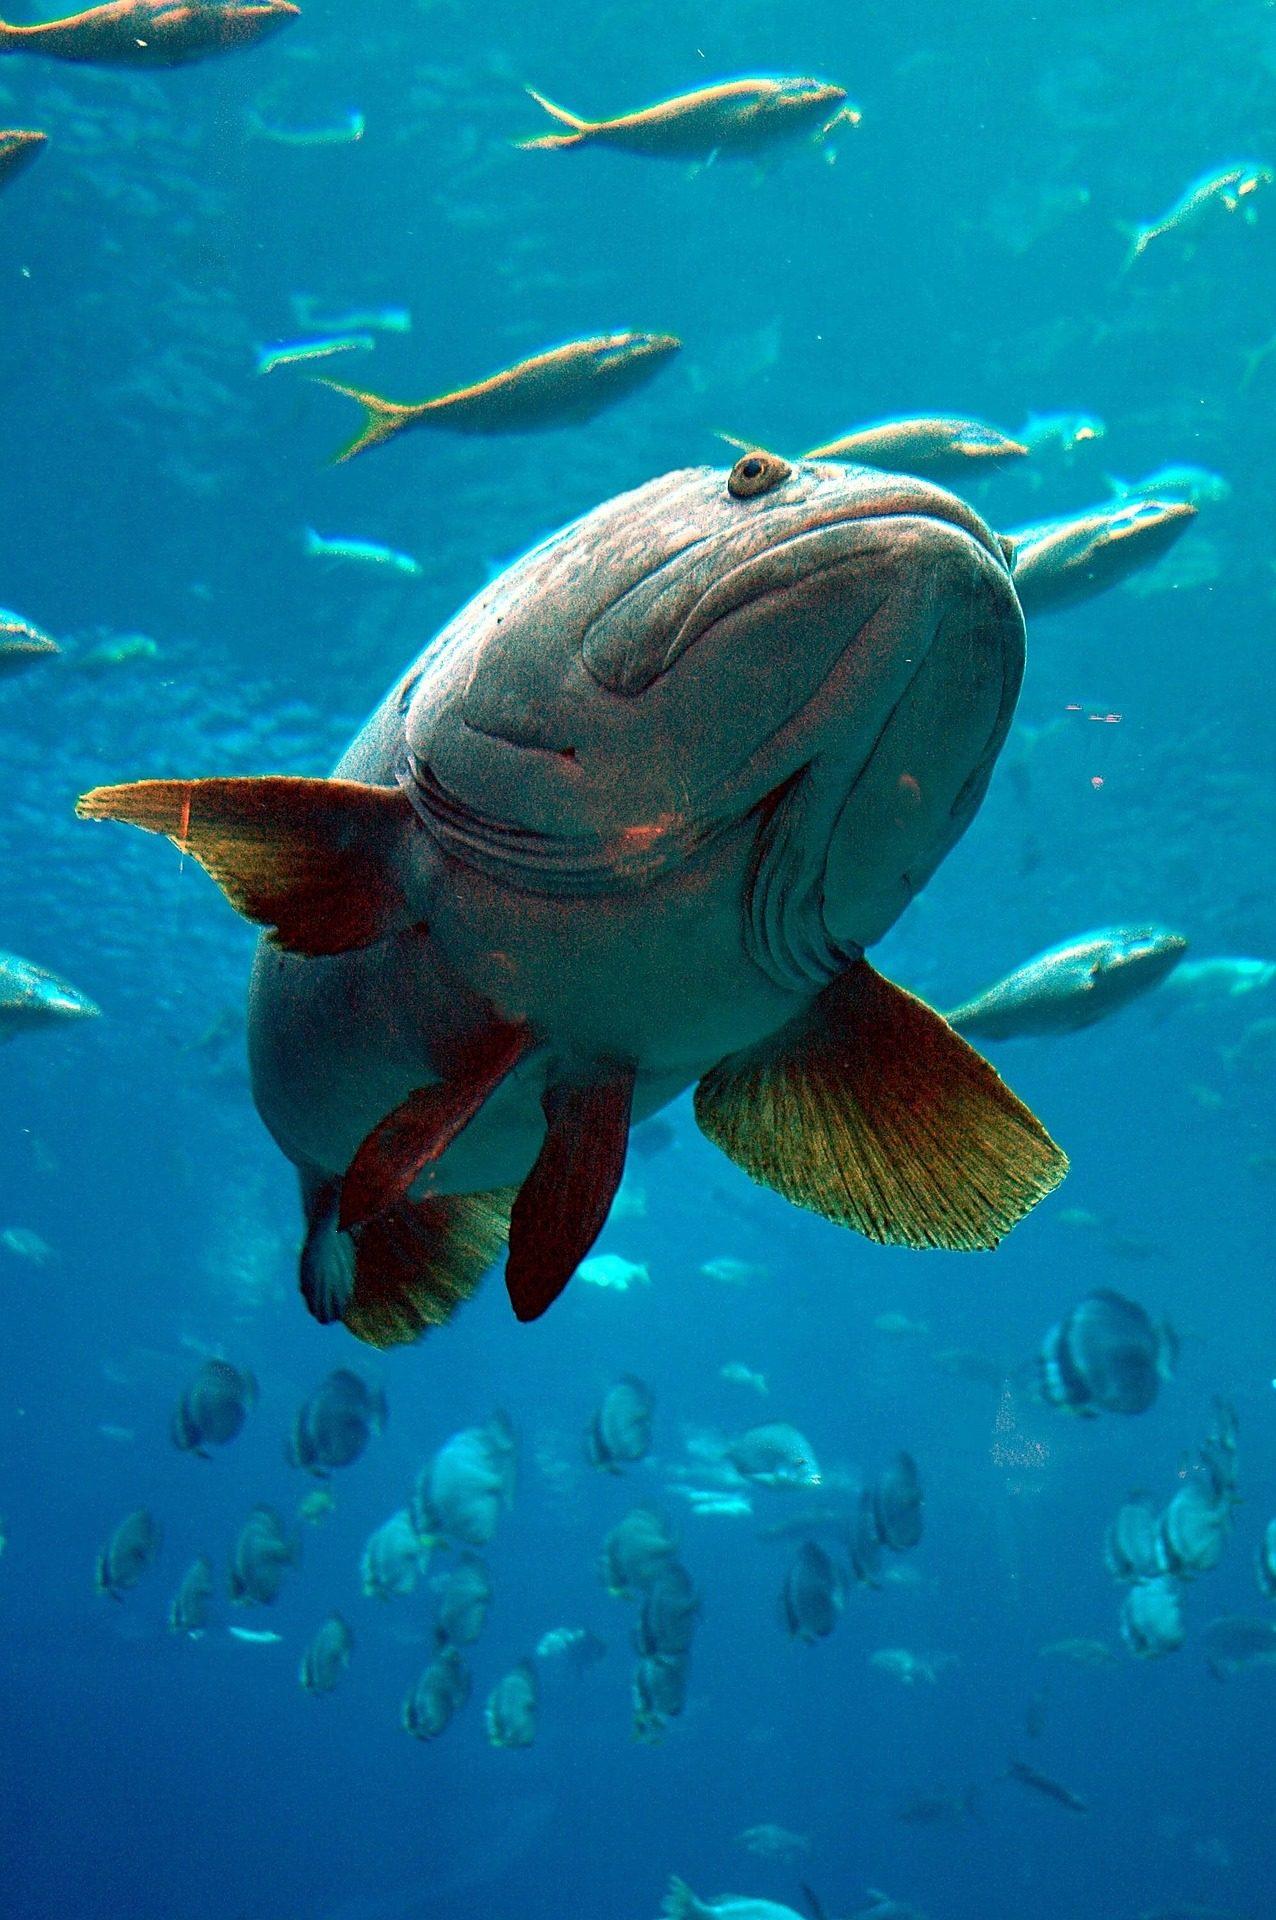 मछली, उष्णकटिबंधीय, मछलीघर, समुद्री जीवन, गिल, पंख - HD वॉलपेपर - प्रोफेसर-falken.com